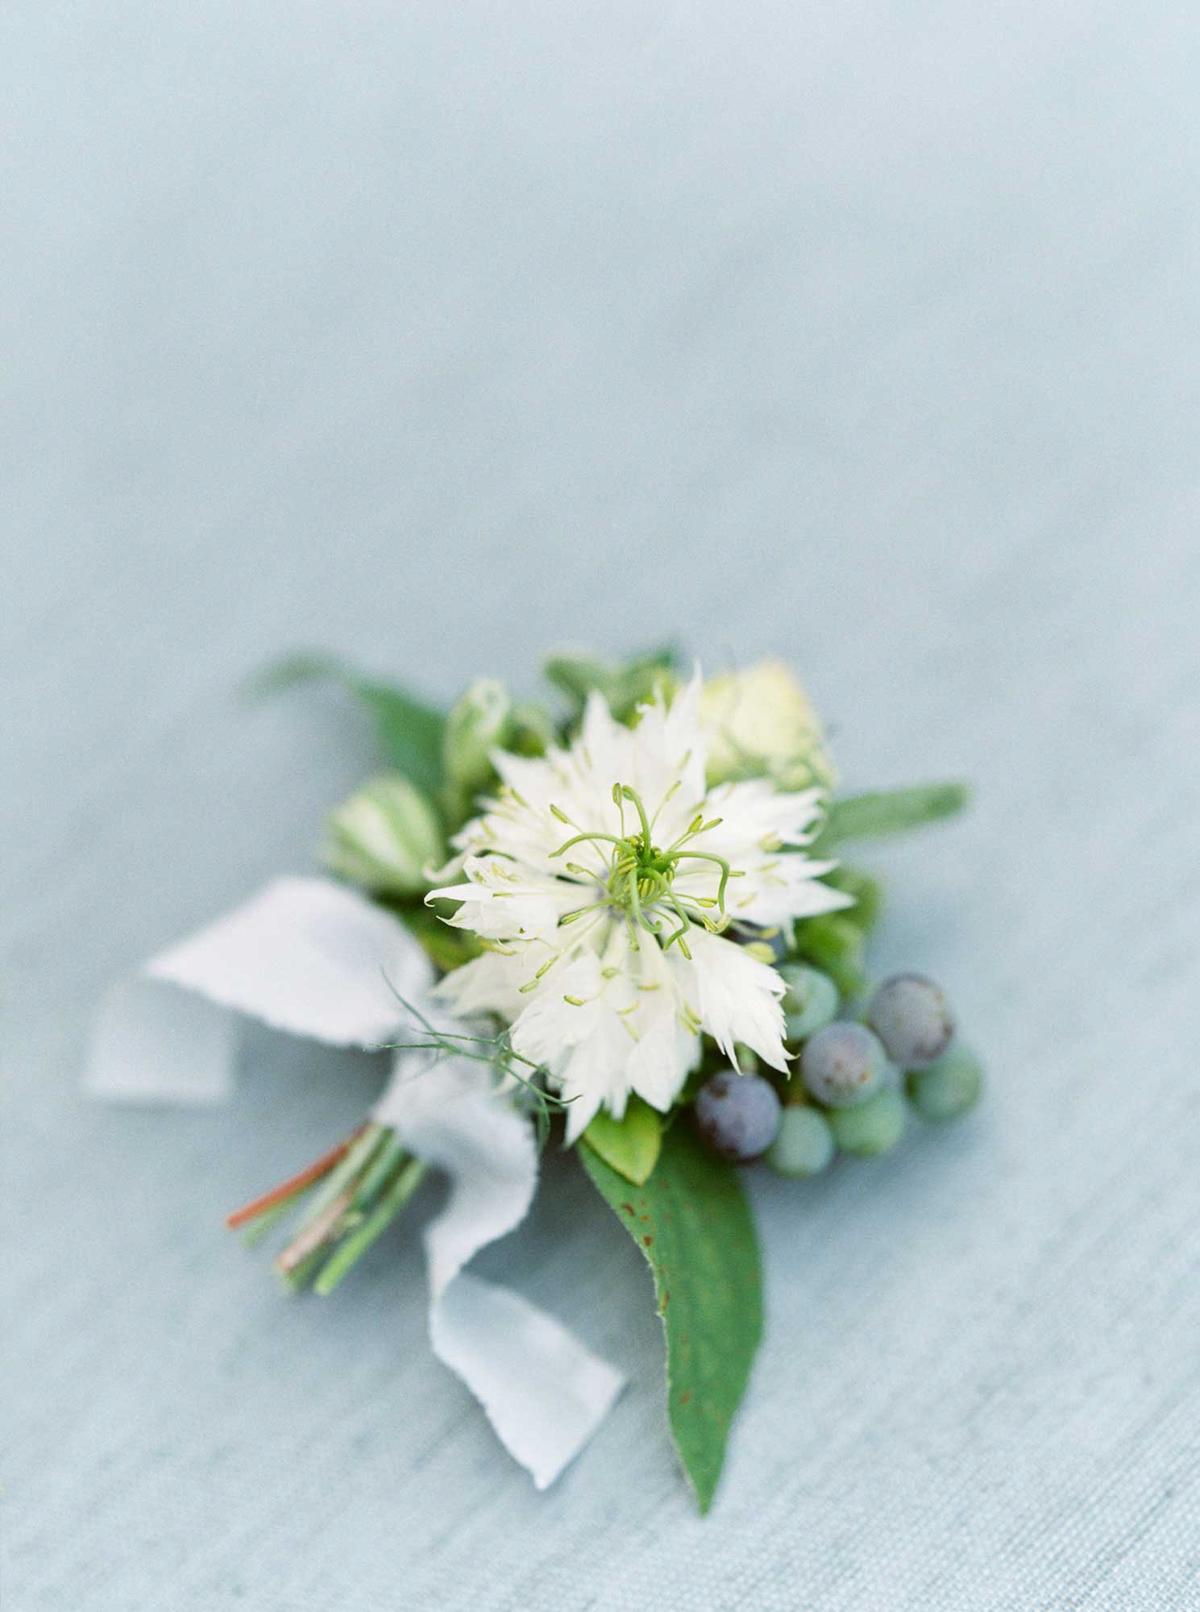 kayla-yestal-vineyard-bride-swish-list-woodland-weddings-niagara-wedding-editorial-13.jpg